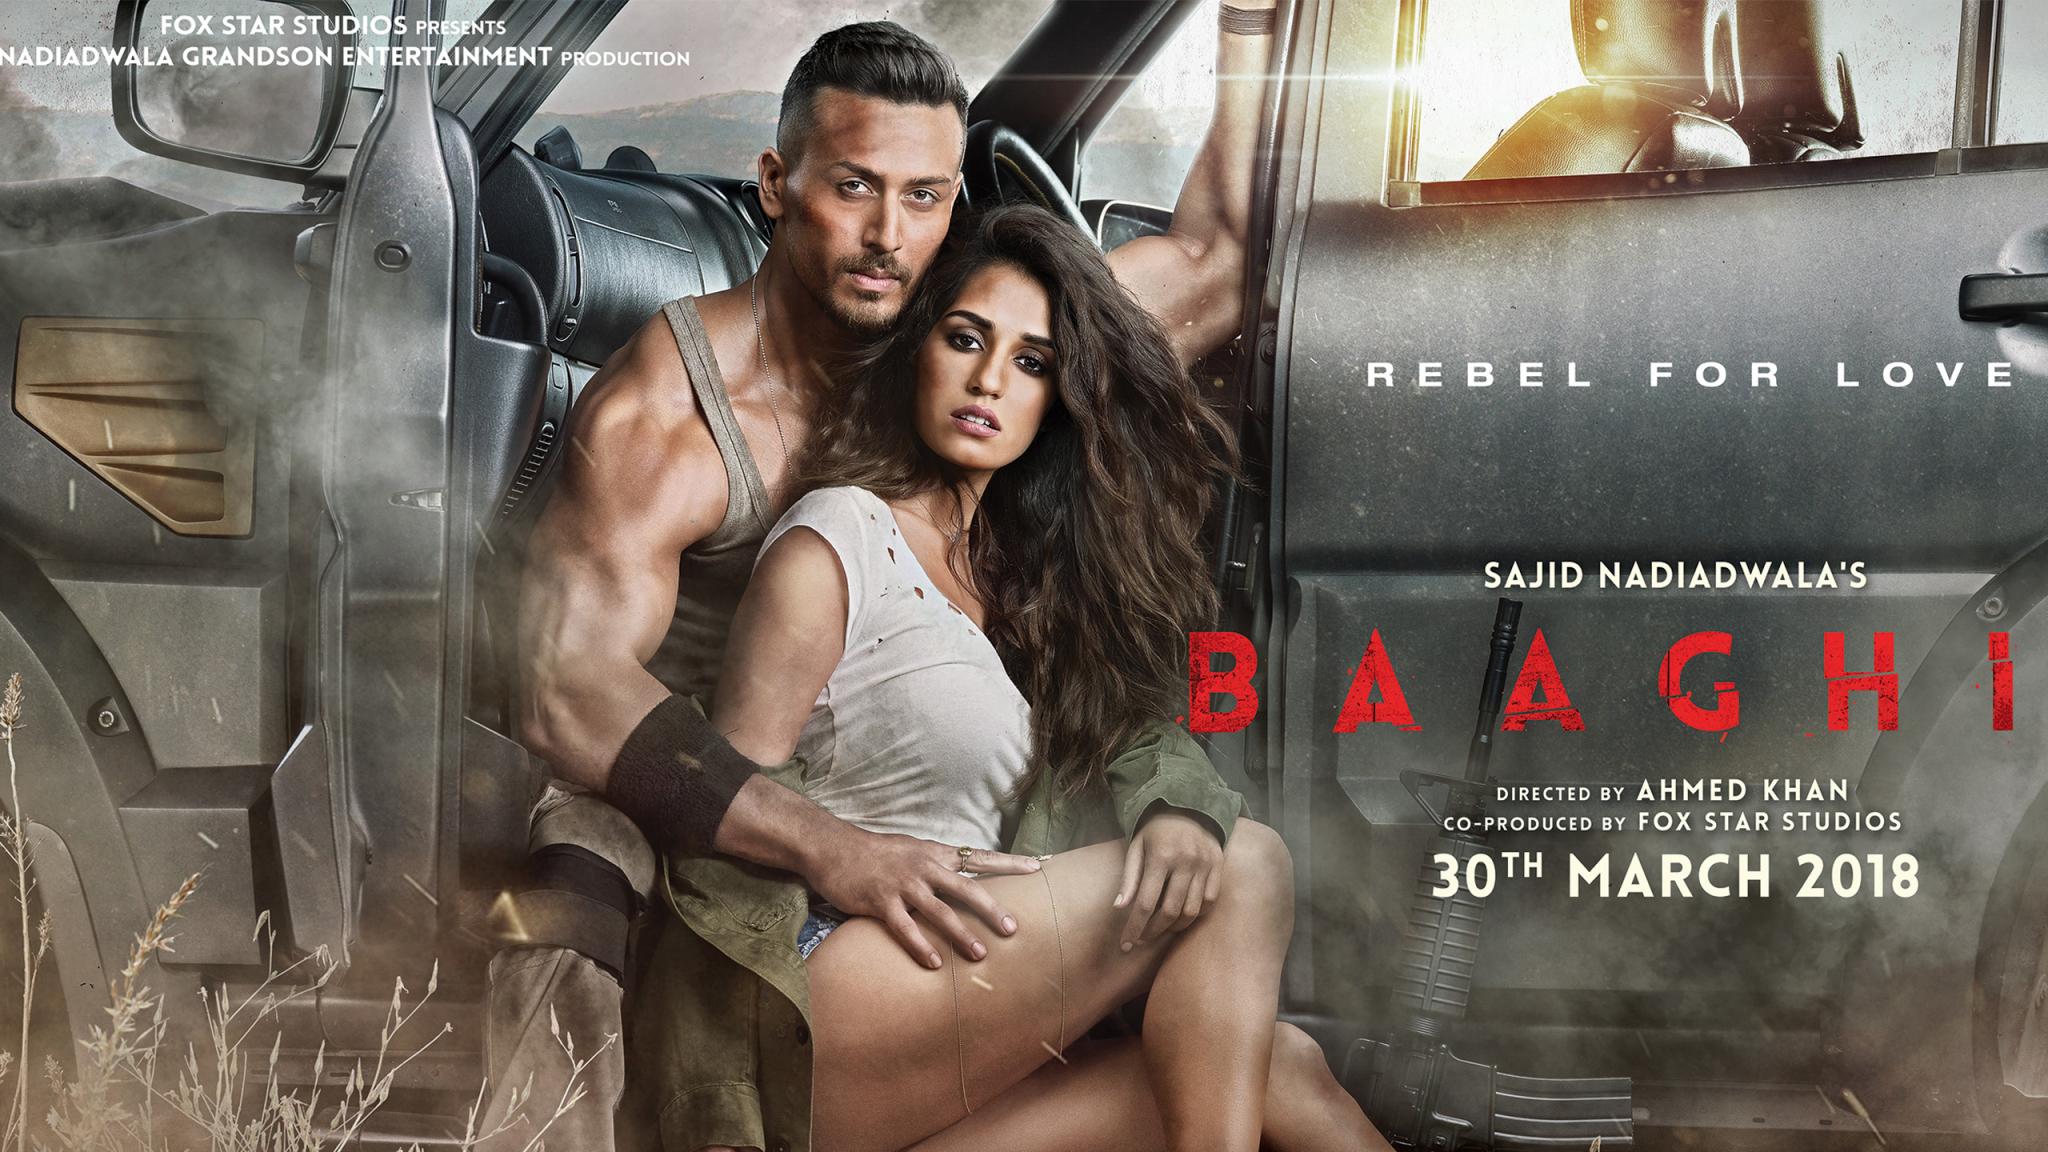 Baaghi 2 official trailer tiger shroff disha patani sajid nadiadwala ahmed khan youtubemkv - 5 10